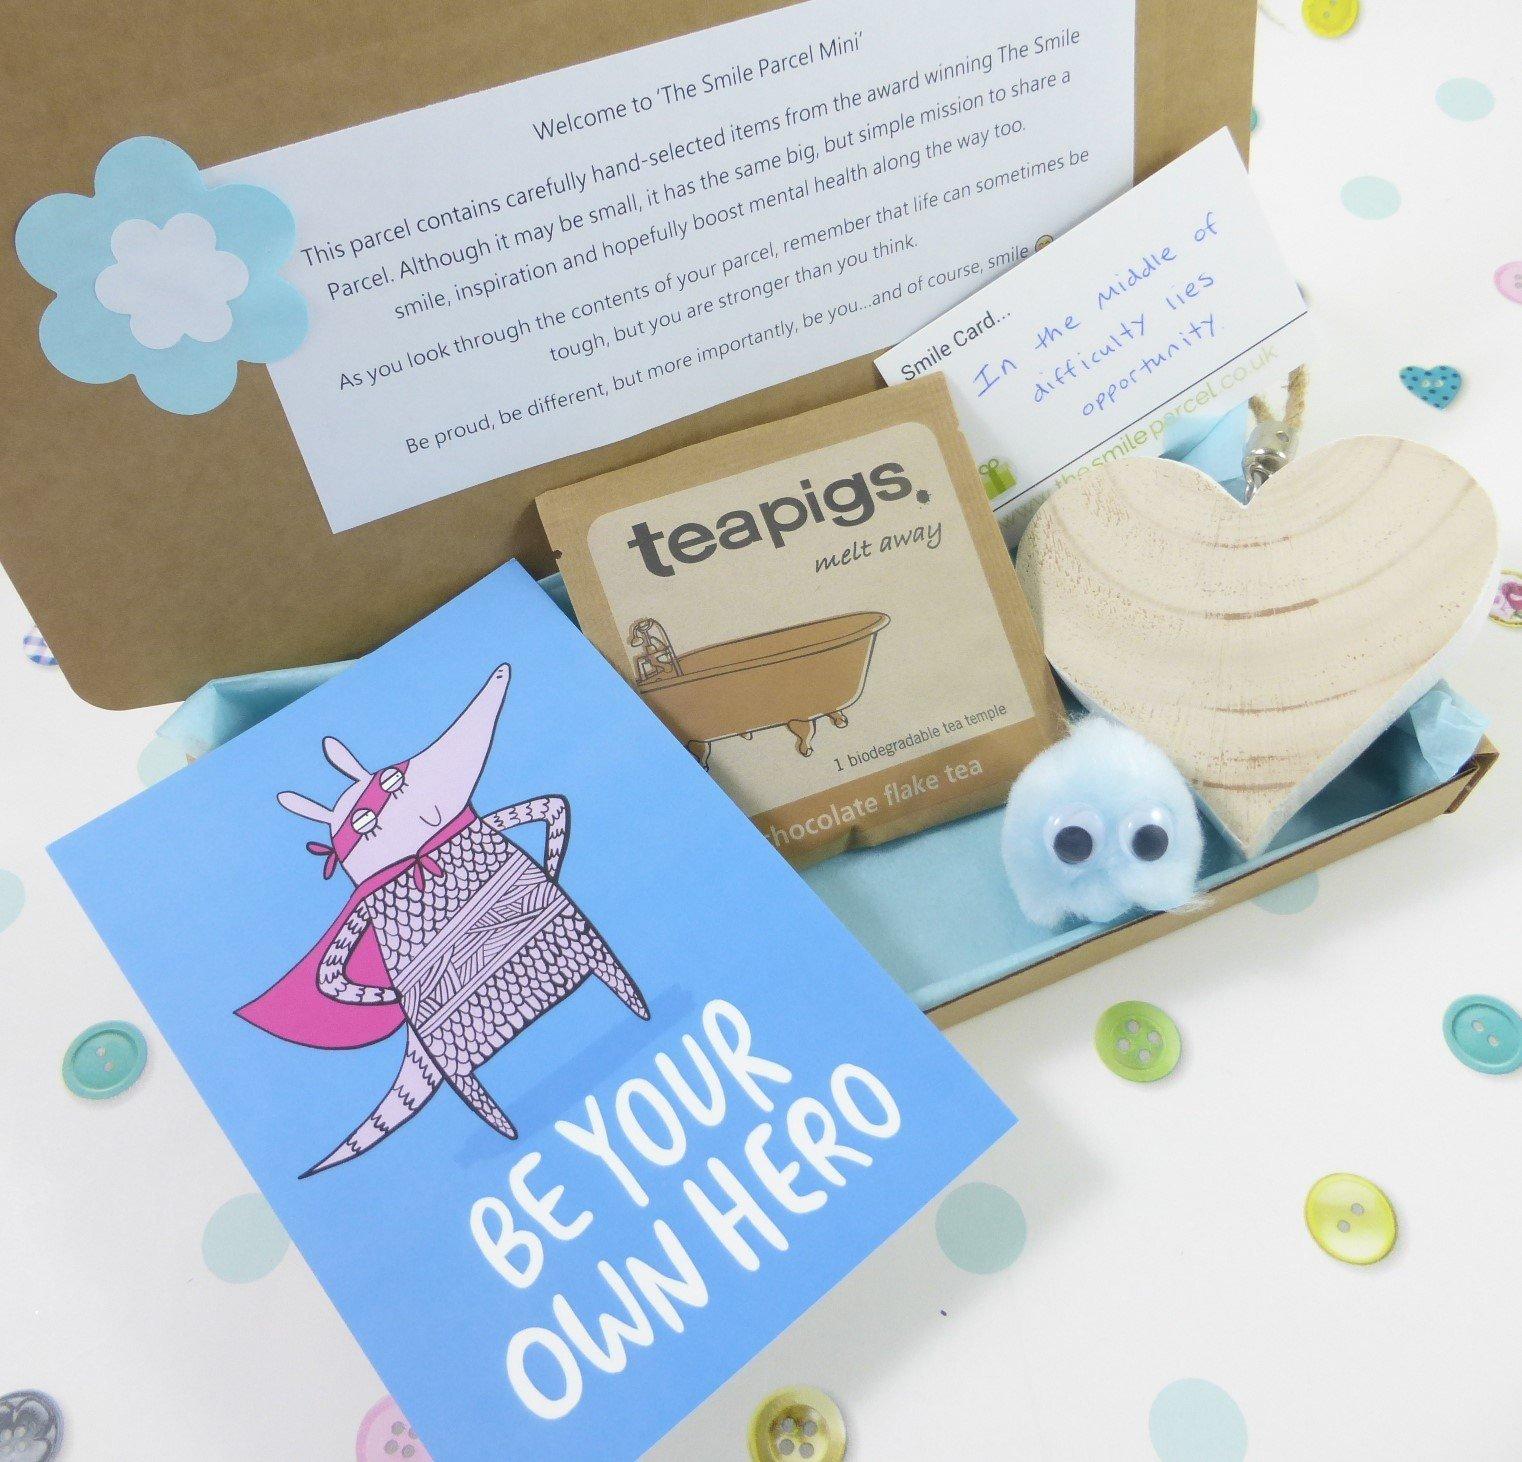 Self care box gift